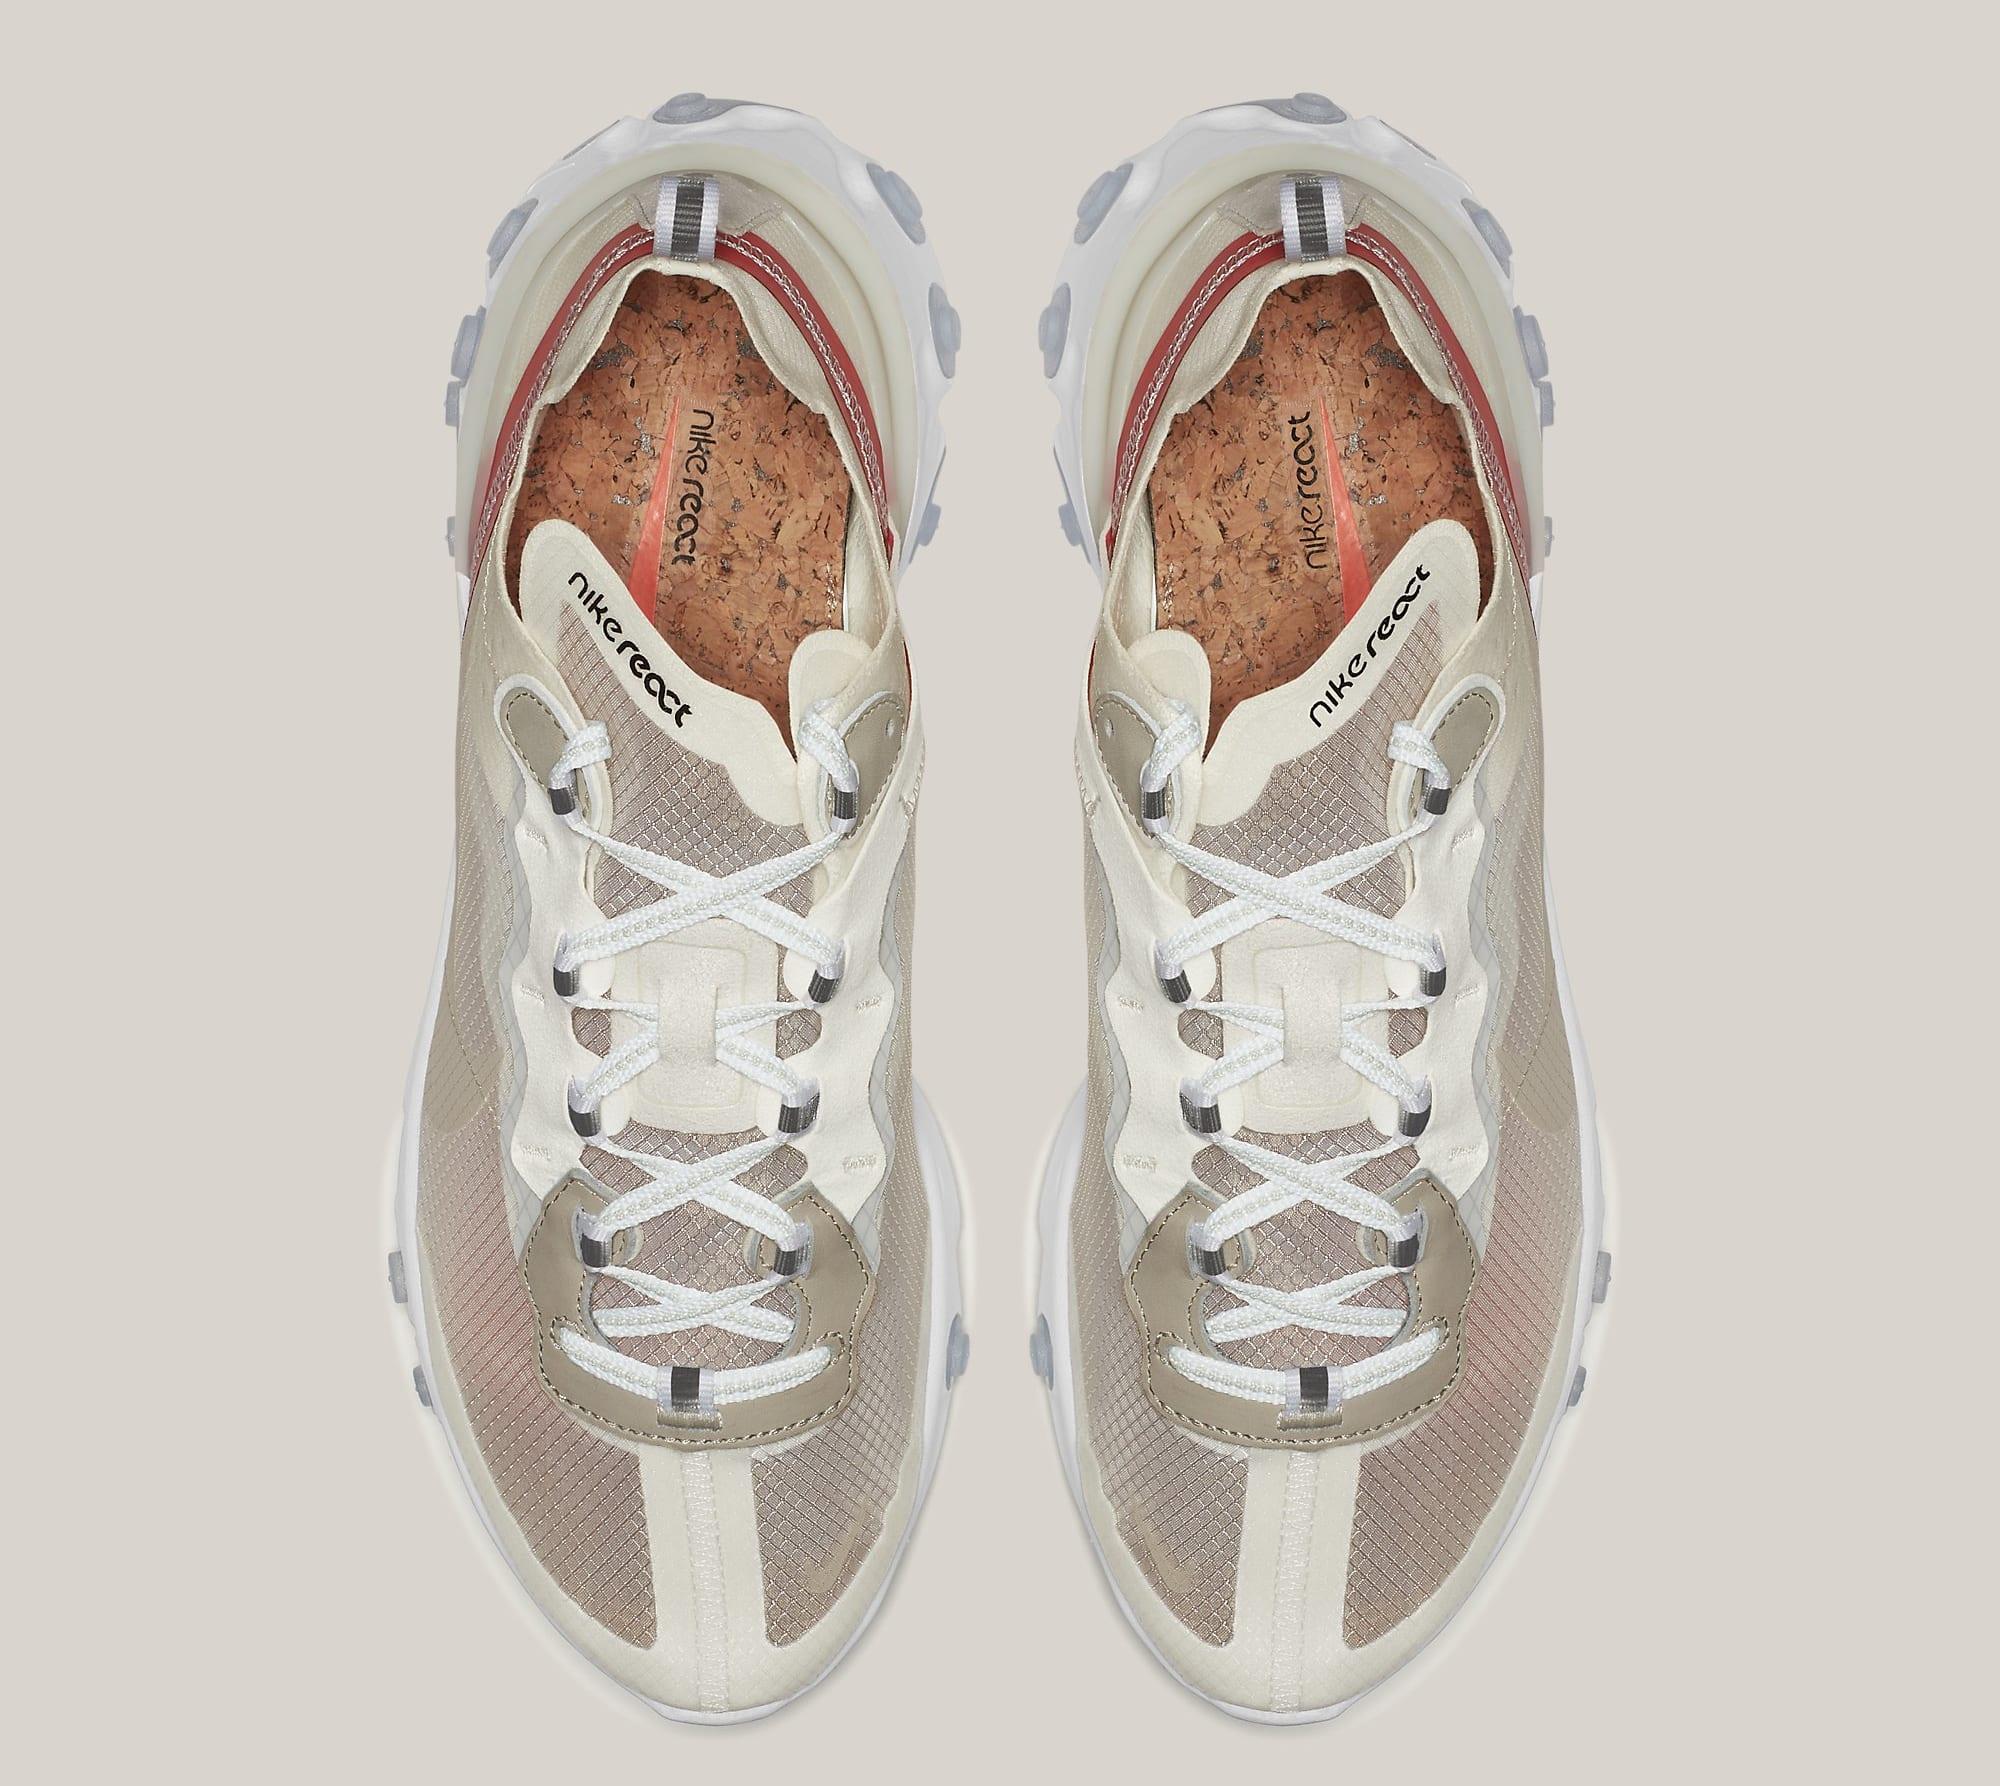 Nike React Element 87 'Sail/Light Bone/White/Rush Orange/Black' AQ1090-100 (Top)